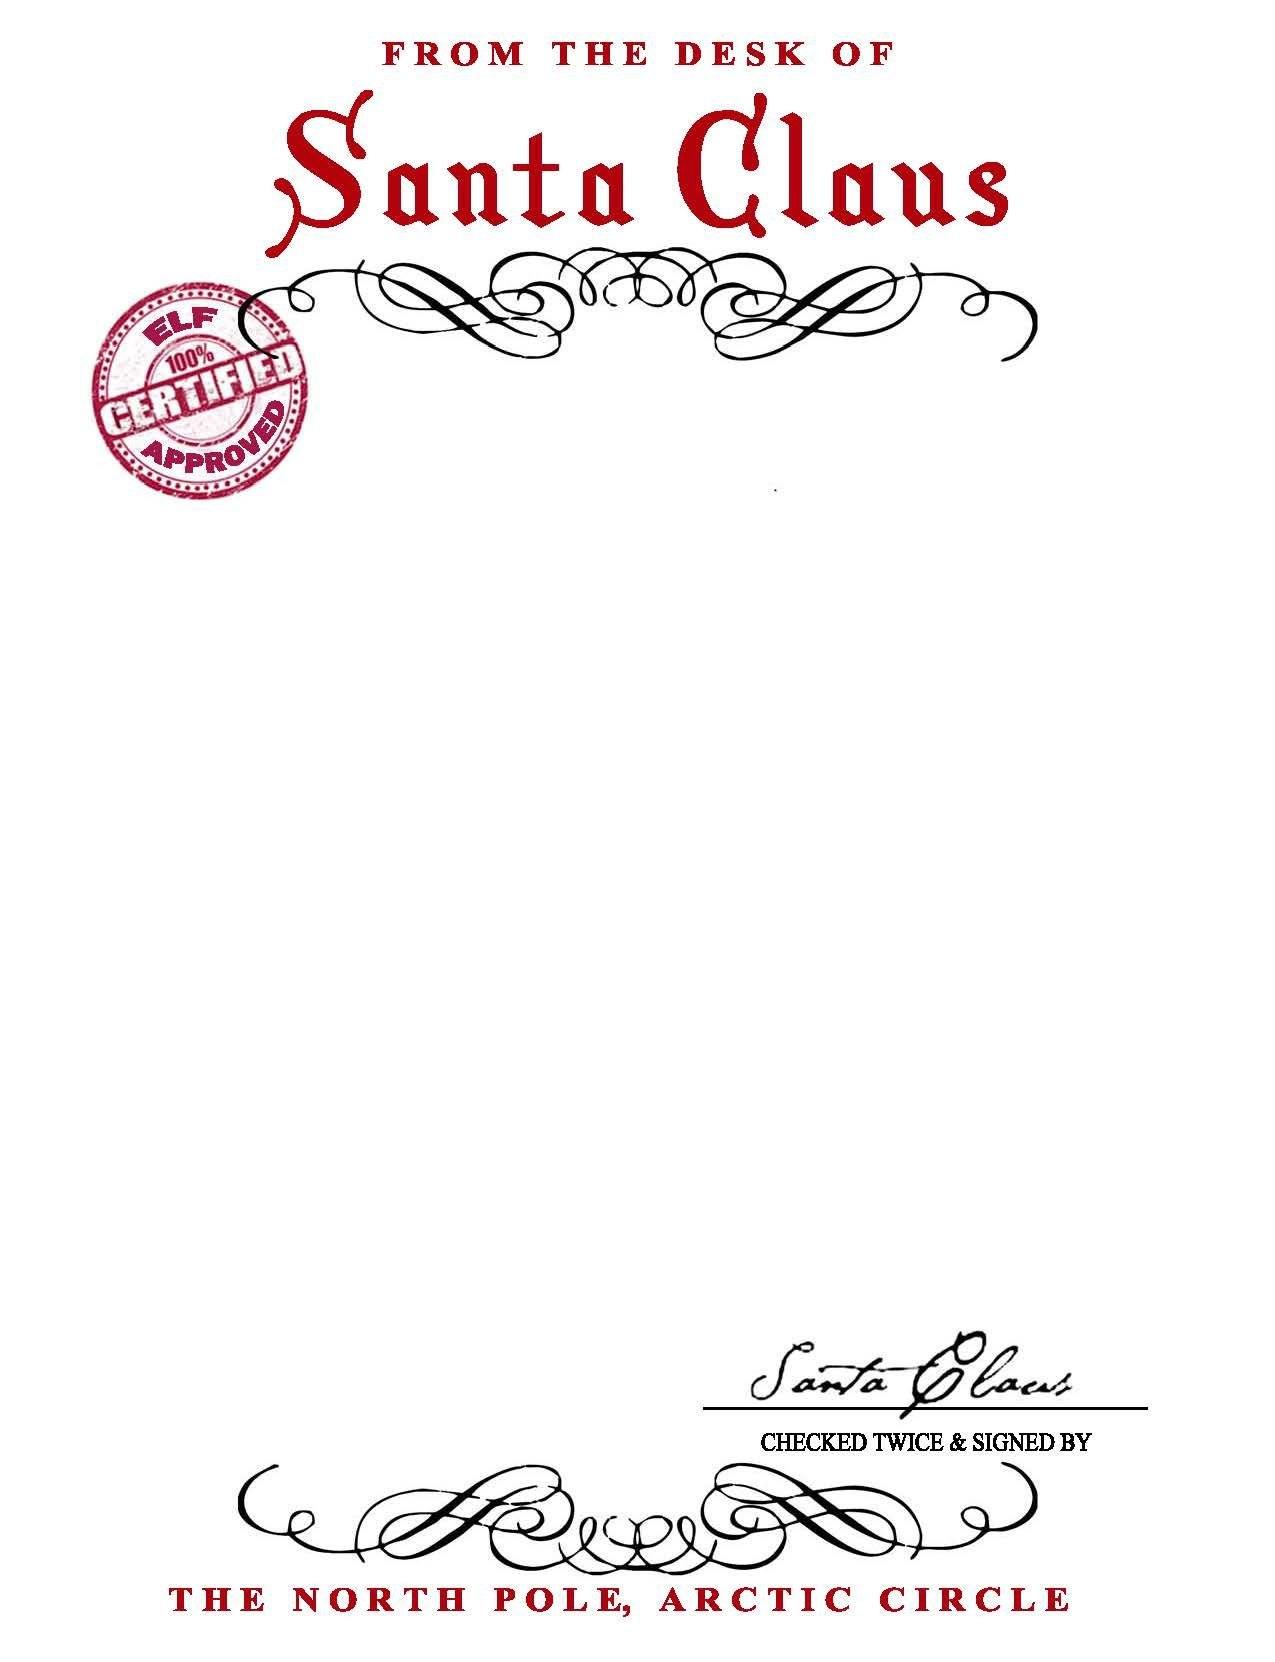 Santa Claus Letterhead Will Bring Lots Of Joy To Children Regarding Letter From Santa Claus Template